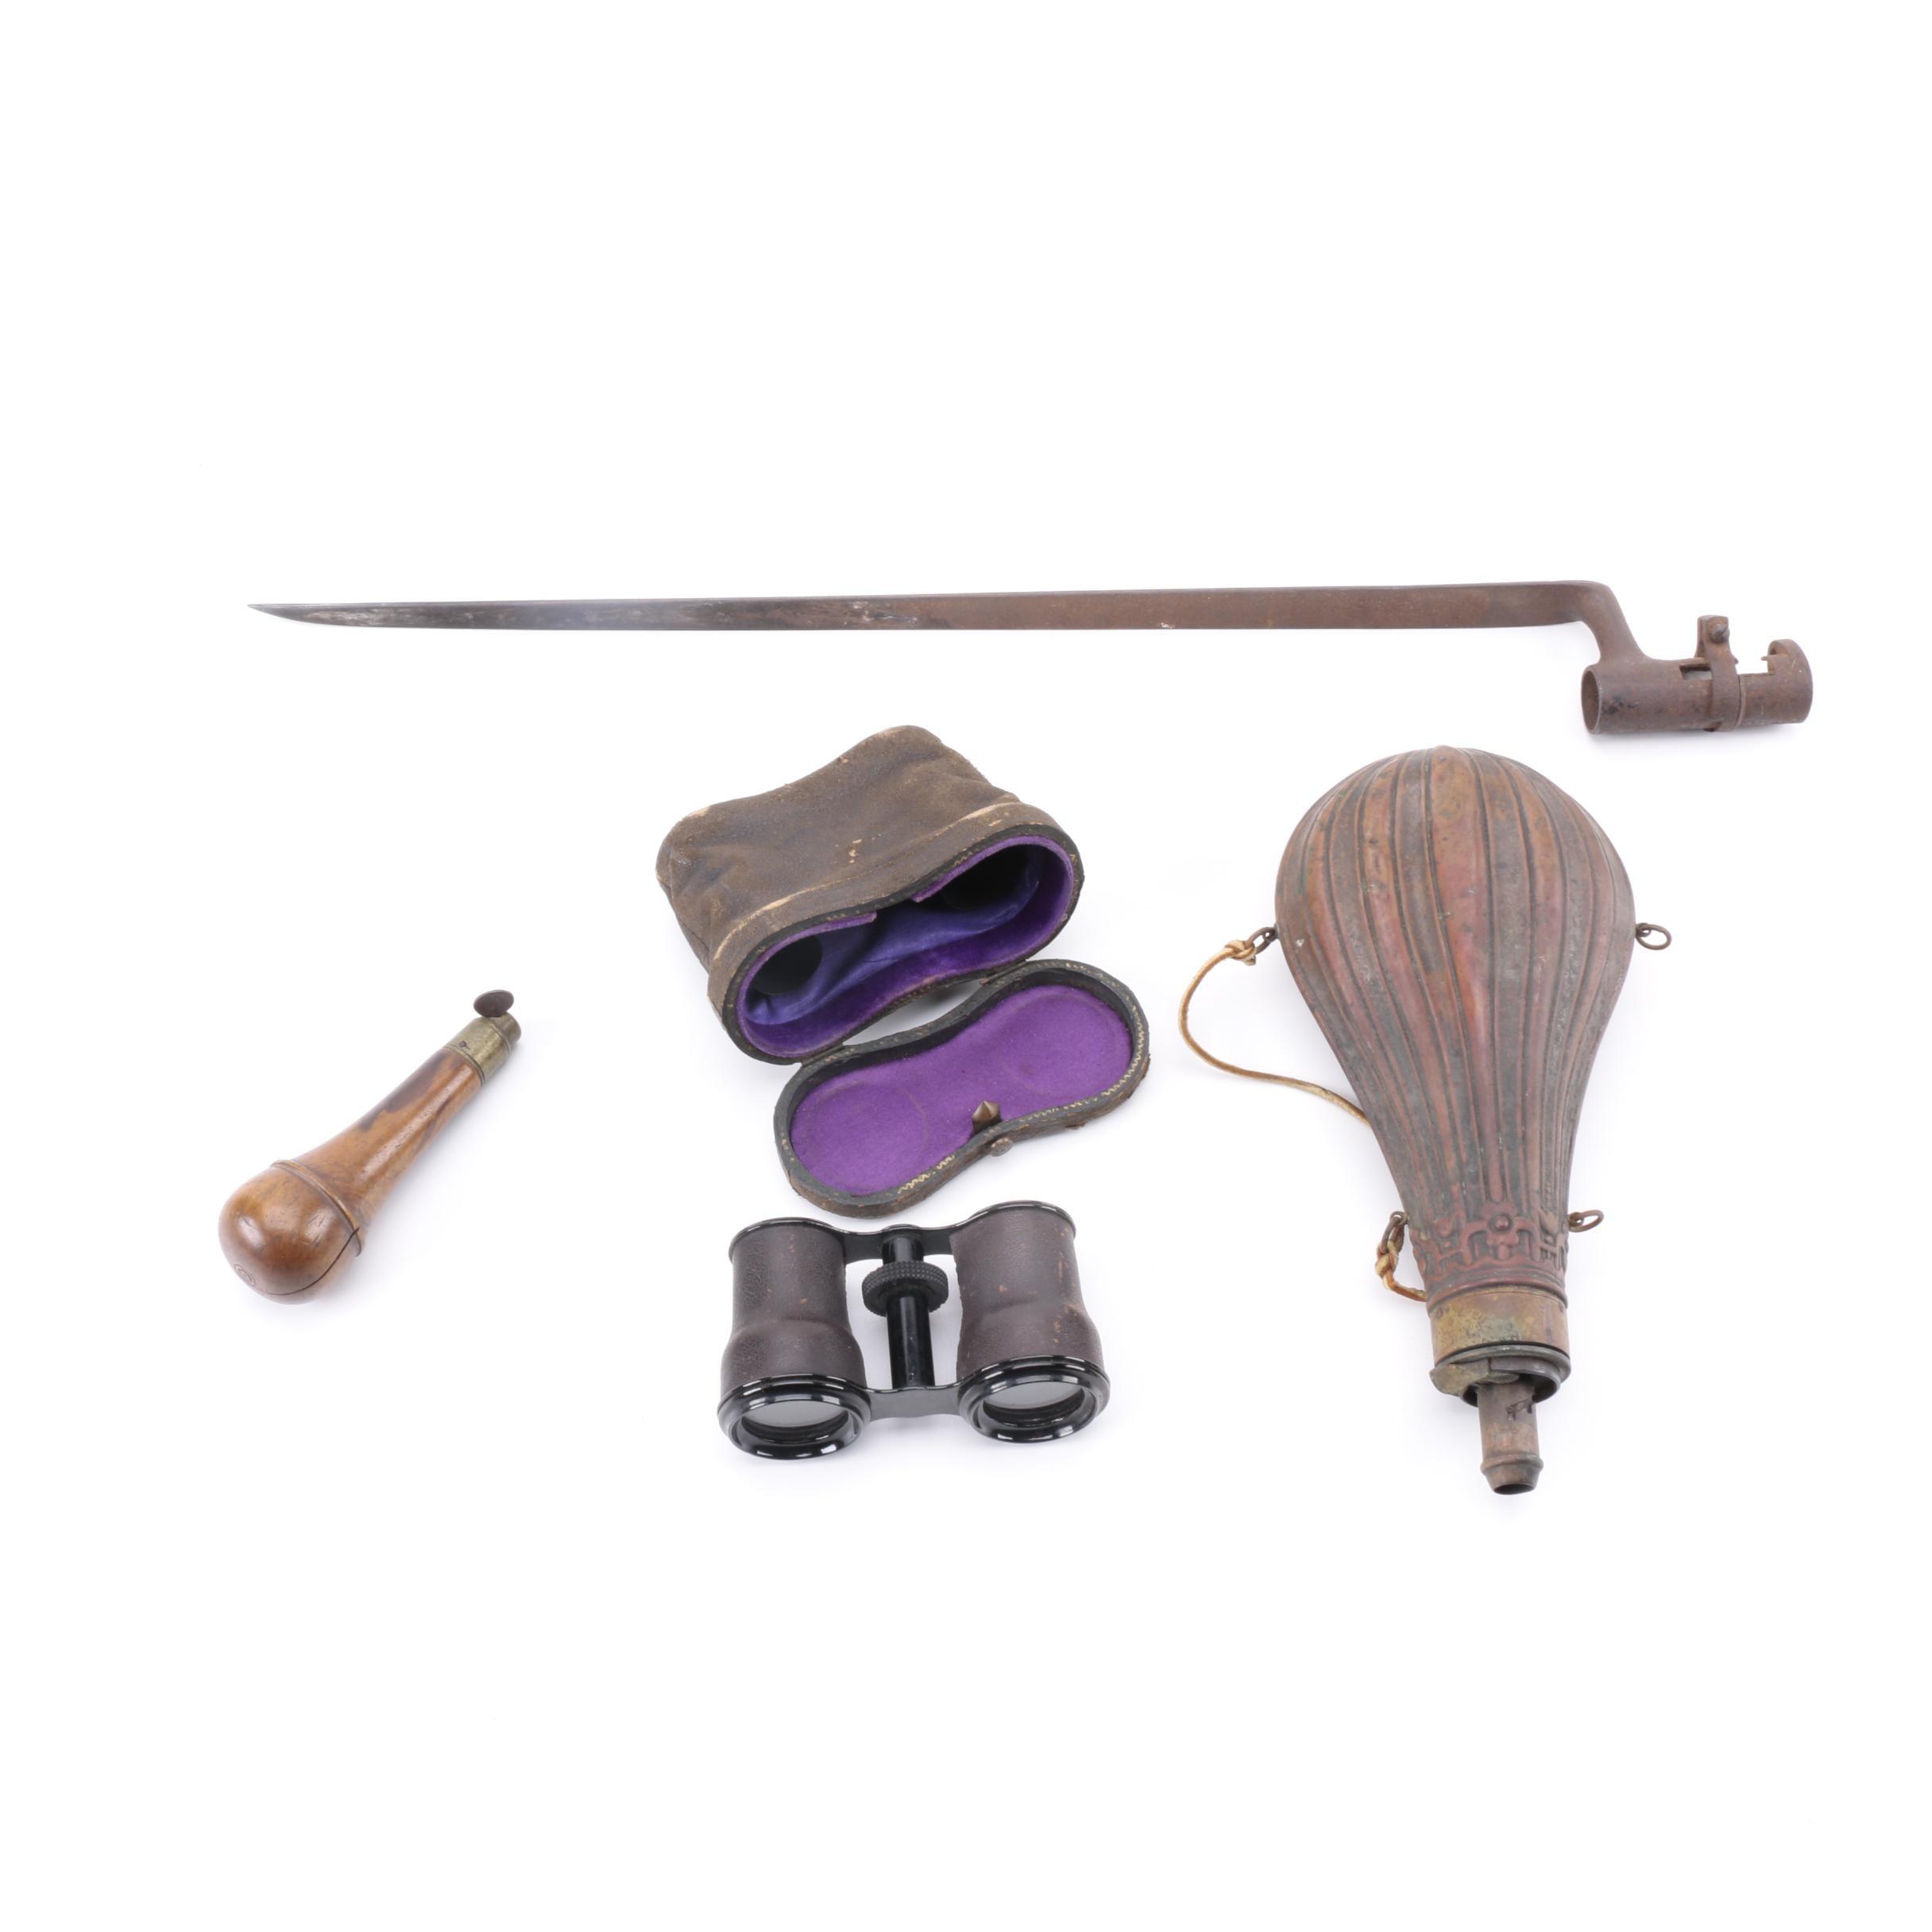 Bayonet, Binoculars, and Powder Horns